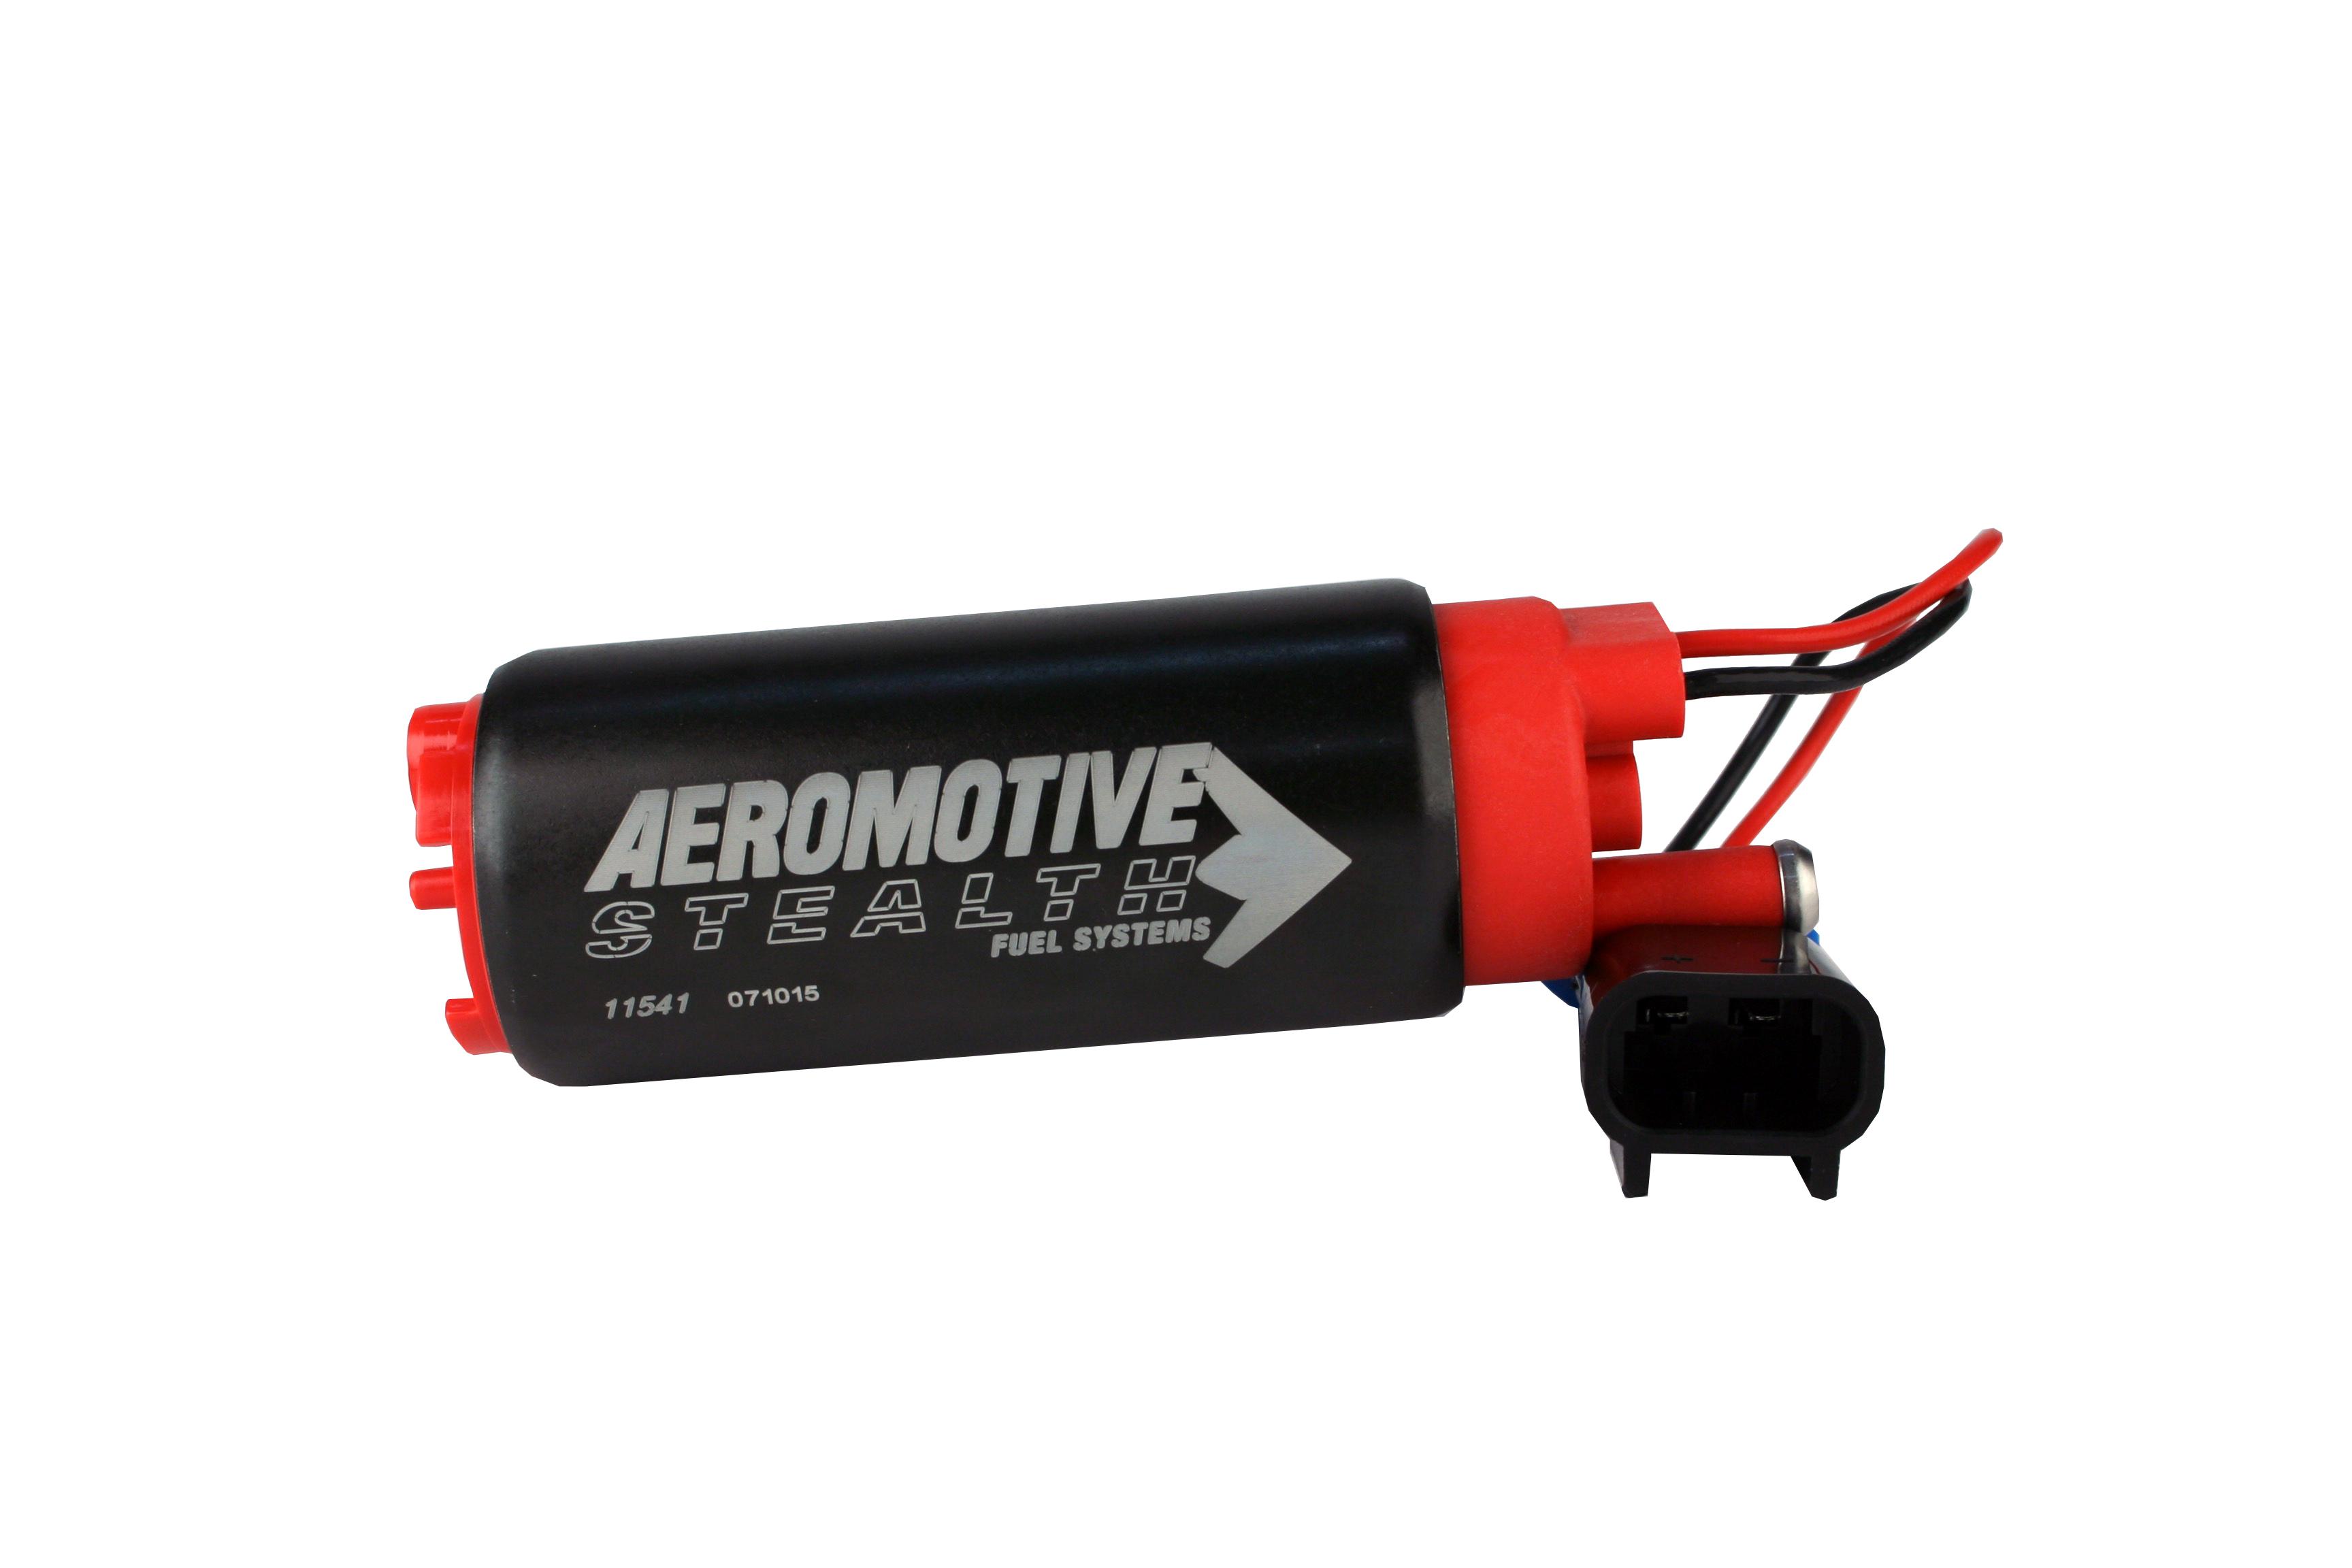 340 Fuel Pump, Offset Inlet – Aeromotive, Inc